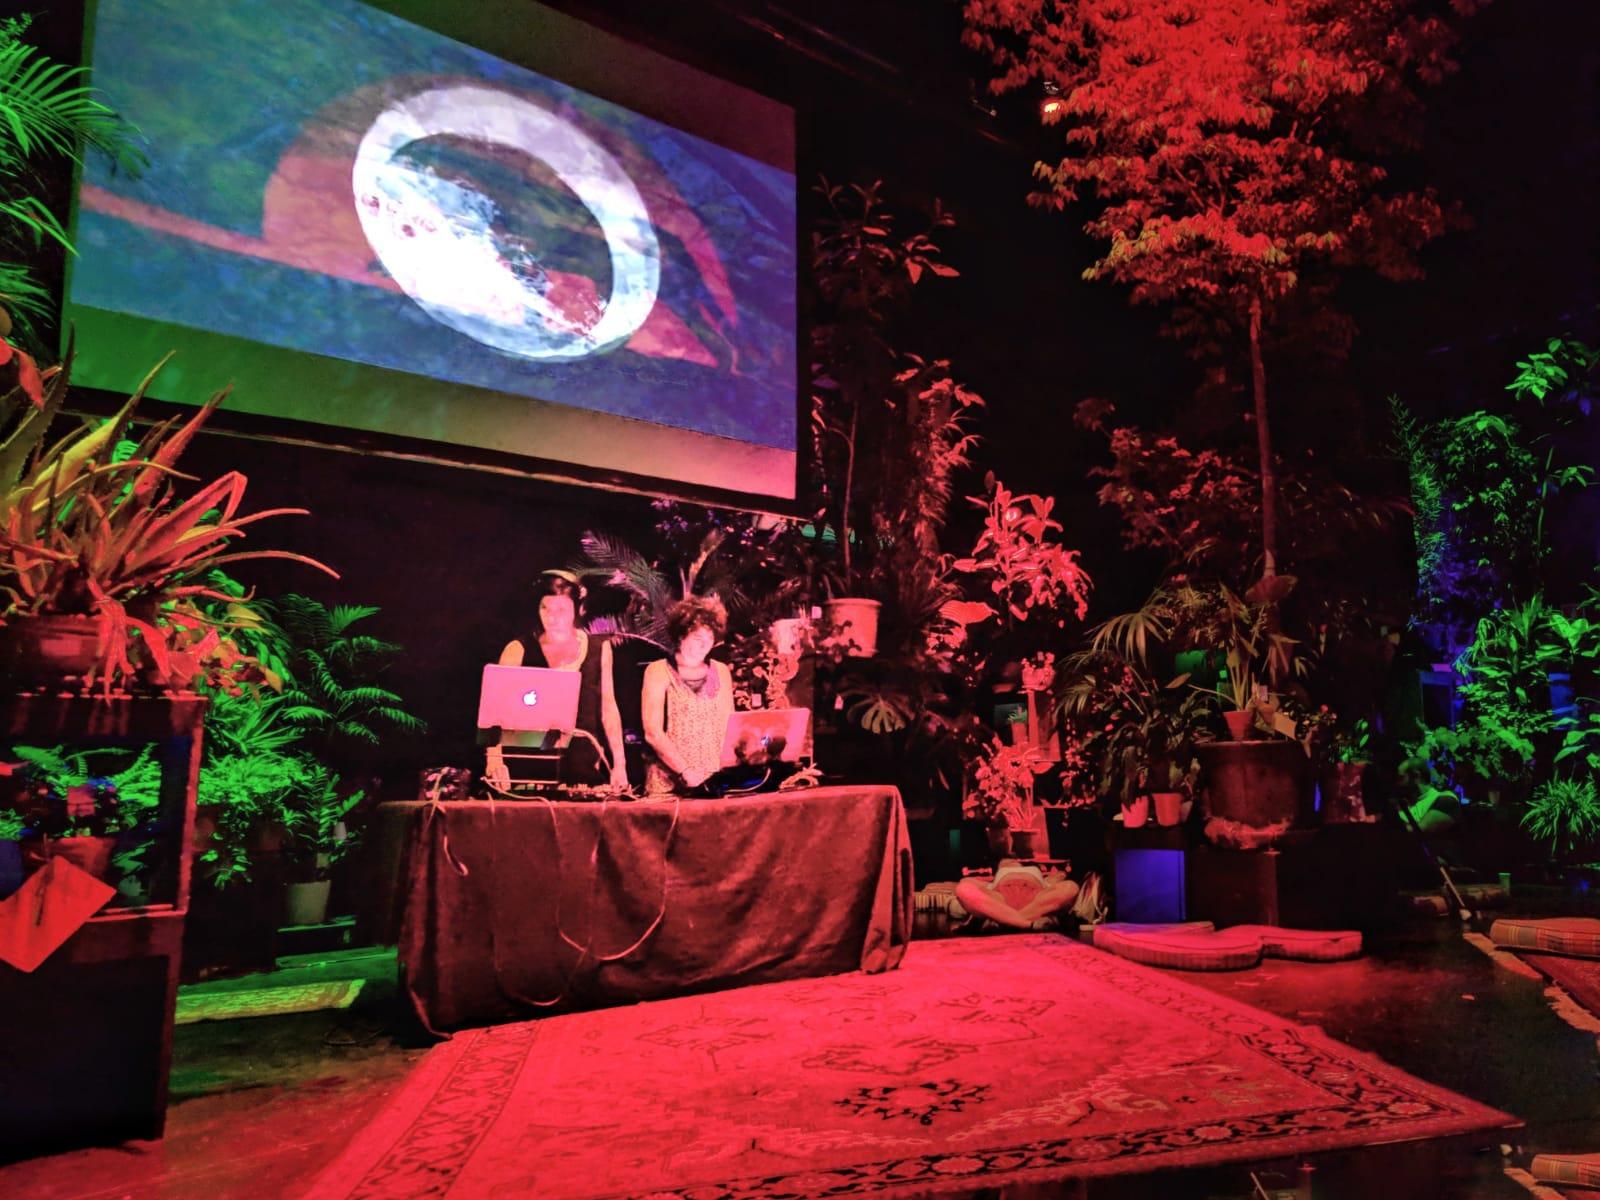 Garden State Conde Duque Madrid Icaro DJ Sharouh VJ Nidra Fabiola Simonetti